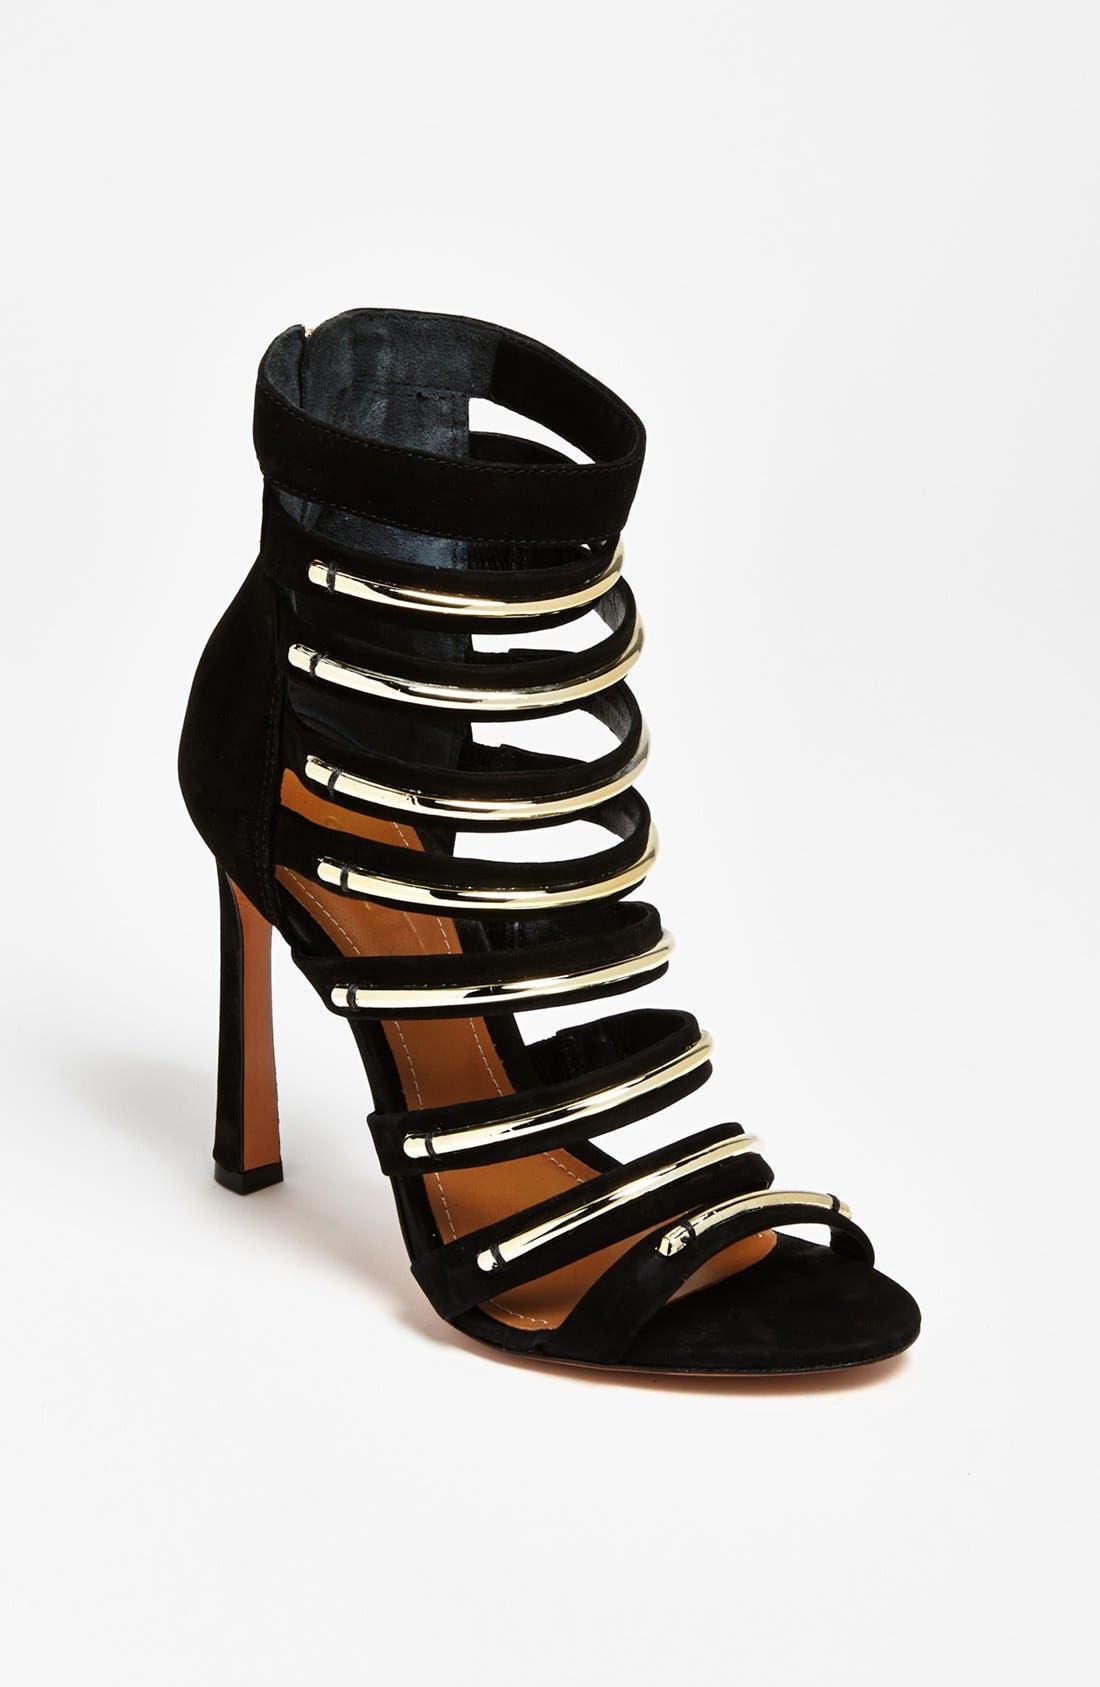 Alternate Image 1 Selected - Schutz 'Biatris' Sandal